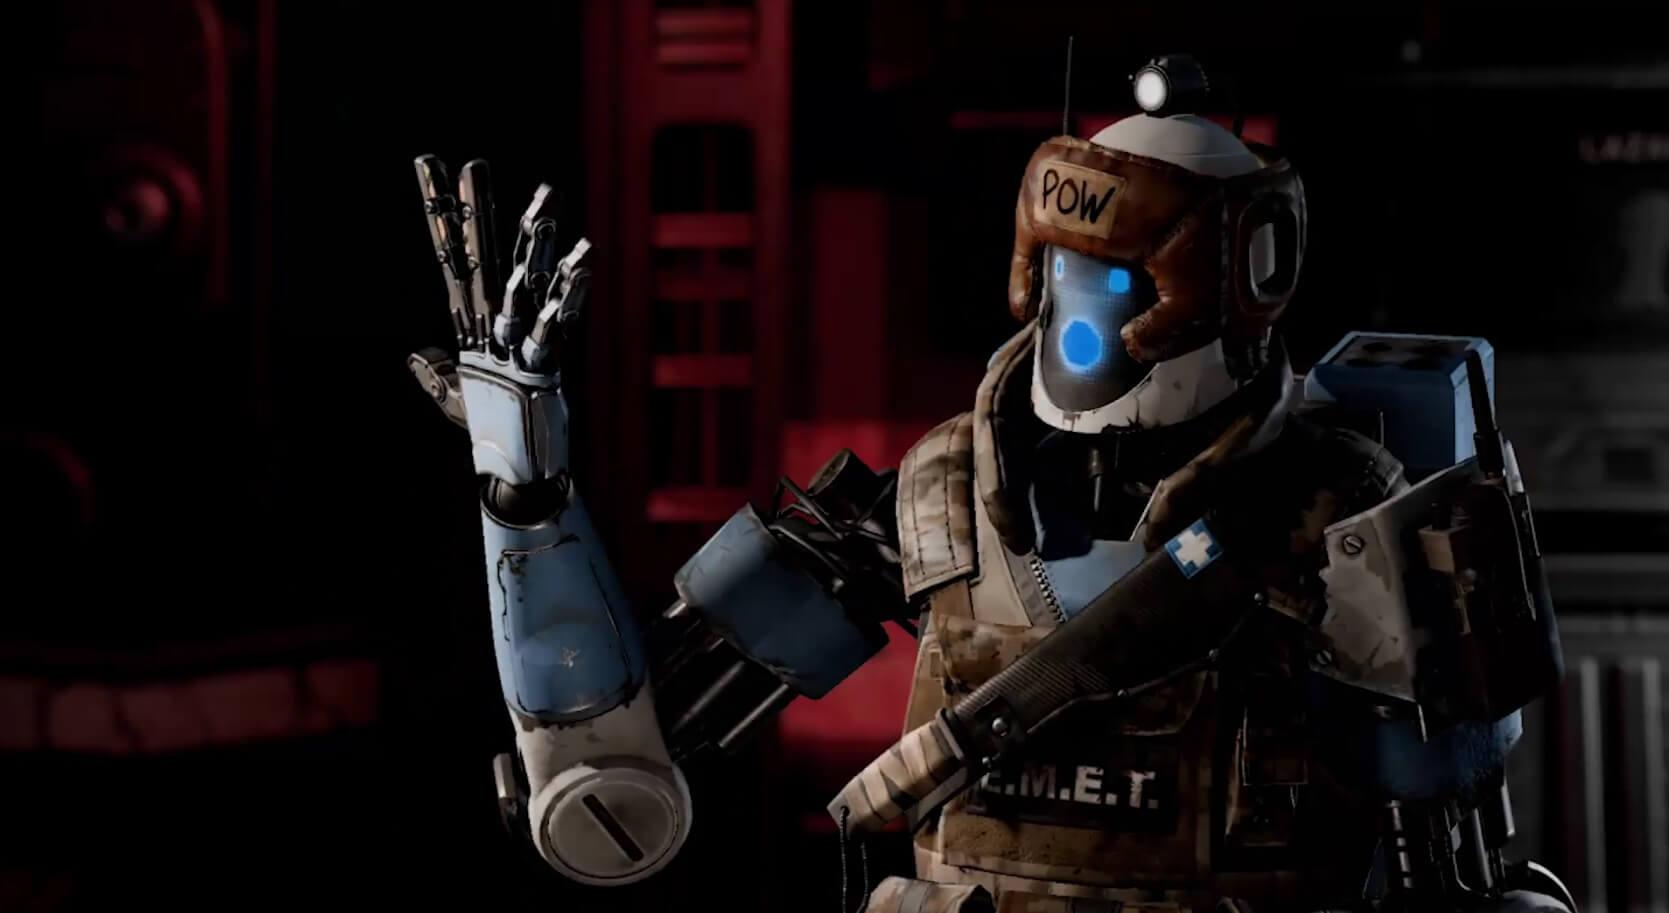 Evolve: Neuer Medic E.M.E.T. kommt, zwei Roboterherzen ticken in seiner Brust